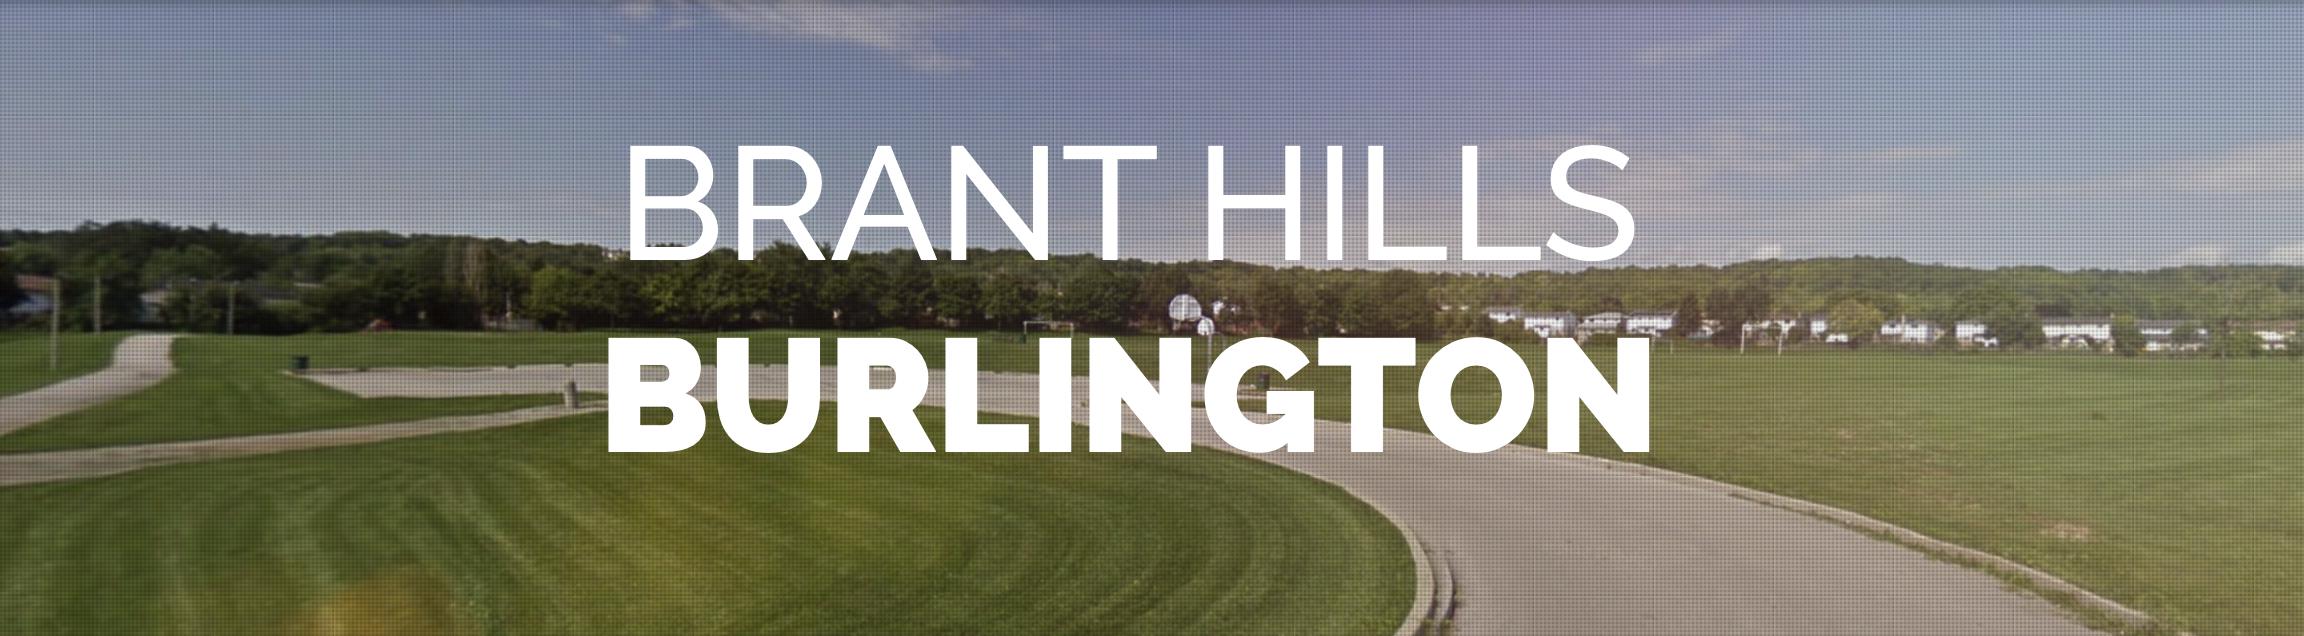 Brant Hills Burlington